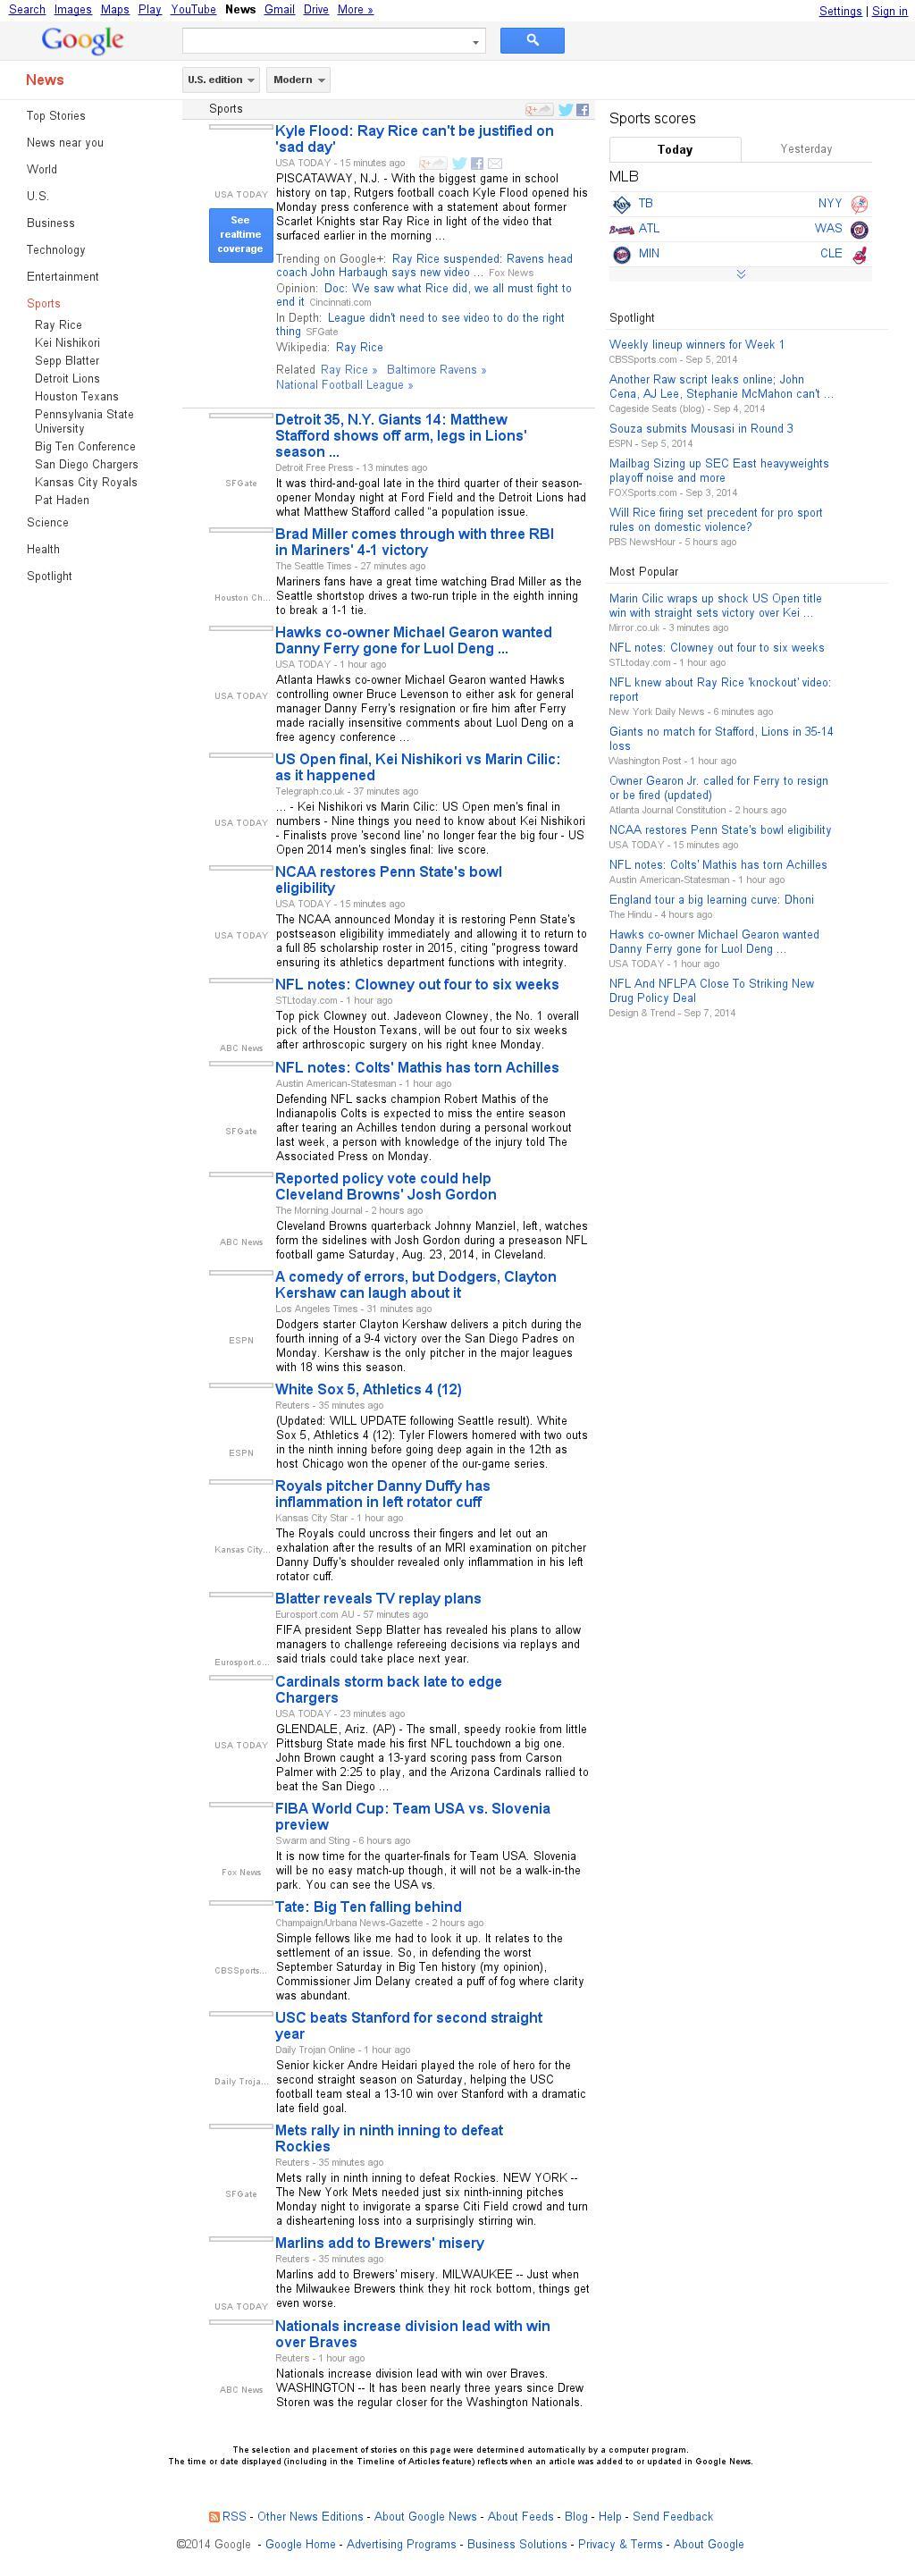 Google News: Sports at Tuesday Sept. 9, 2014, 7:06 a.m. UTC